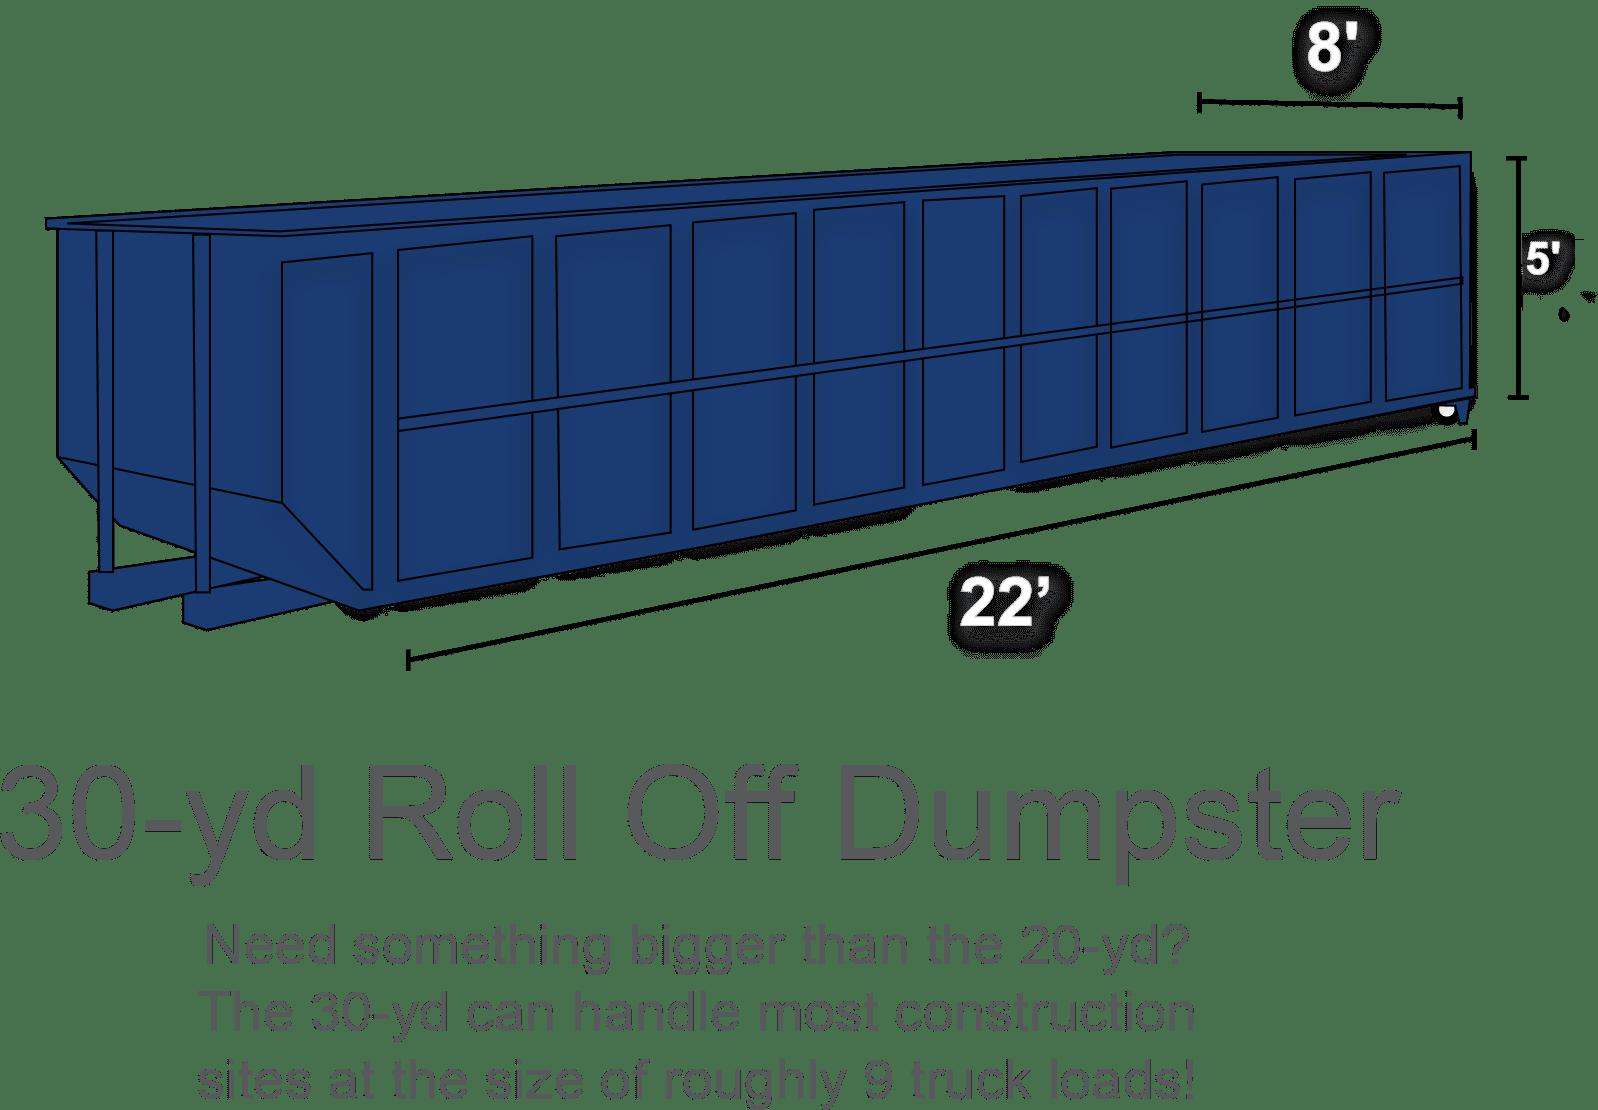 30 Yard Roll over dumpster rental